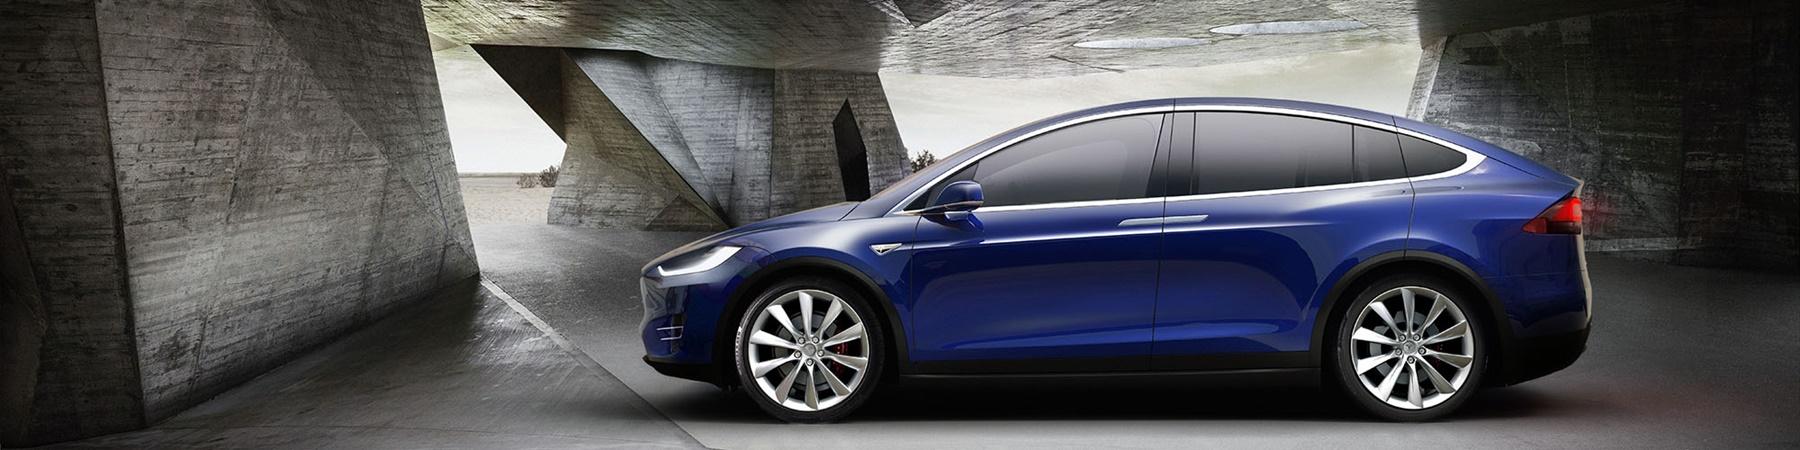 Tesla Model X 100kWh 429 km actieradius